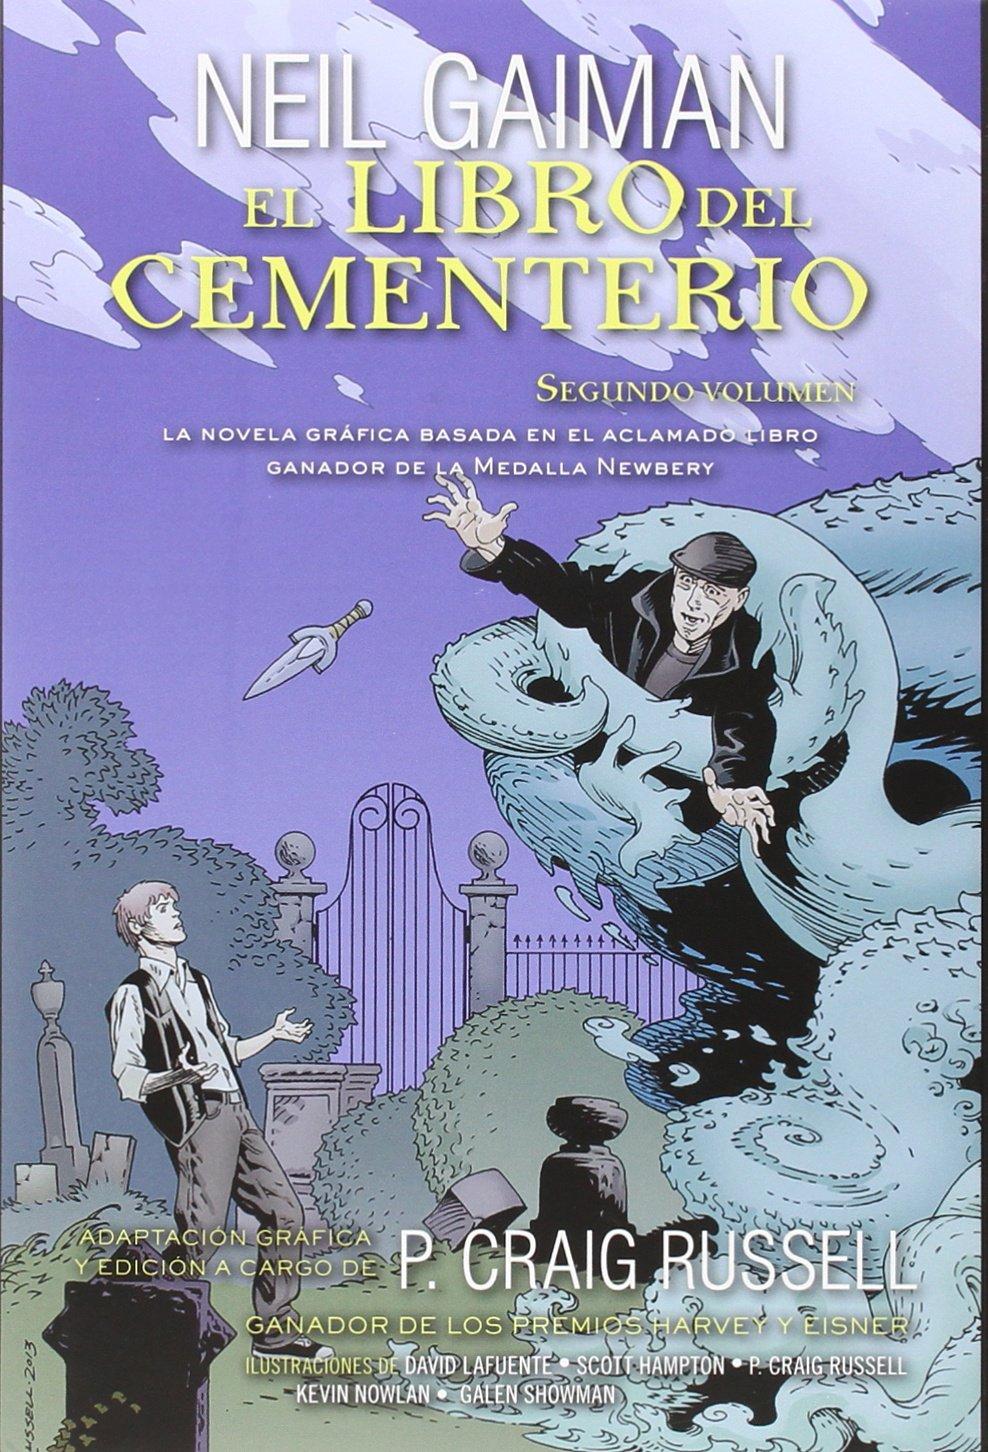 Amazon.com: El libro del cementerio (Young Adult) Vol. II (El Libro Del Cementerio / Tha Graveyard) (Spanish Edition) (9788499189192): Neil Gaiman: Books